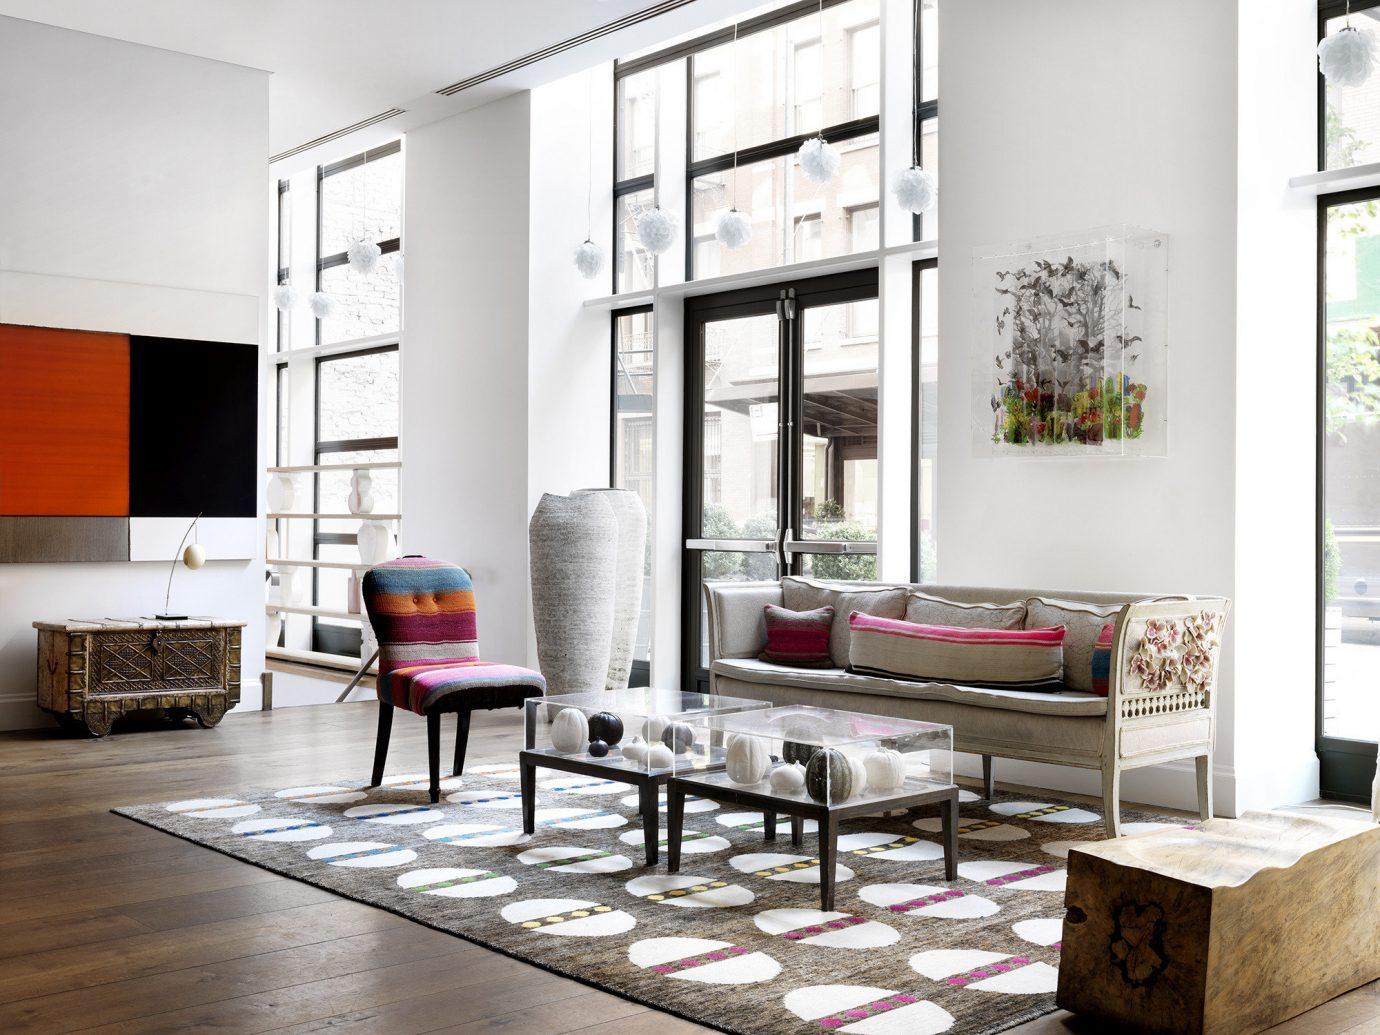 Style + Design indoor Living floor living room room furniture interior design home Design flooring dining room loft window covering table